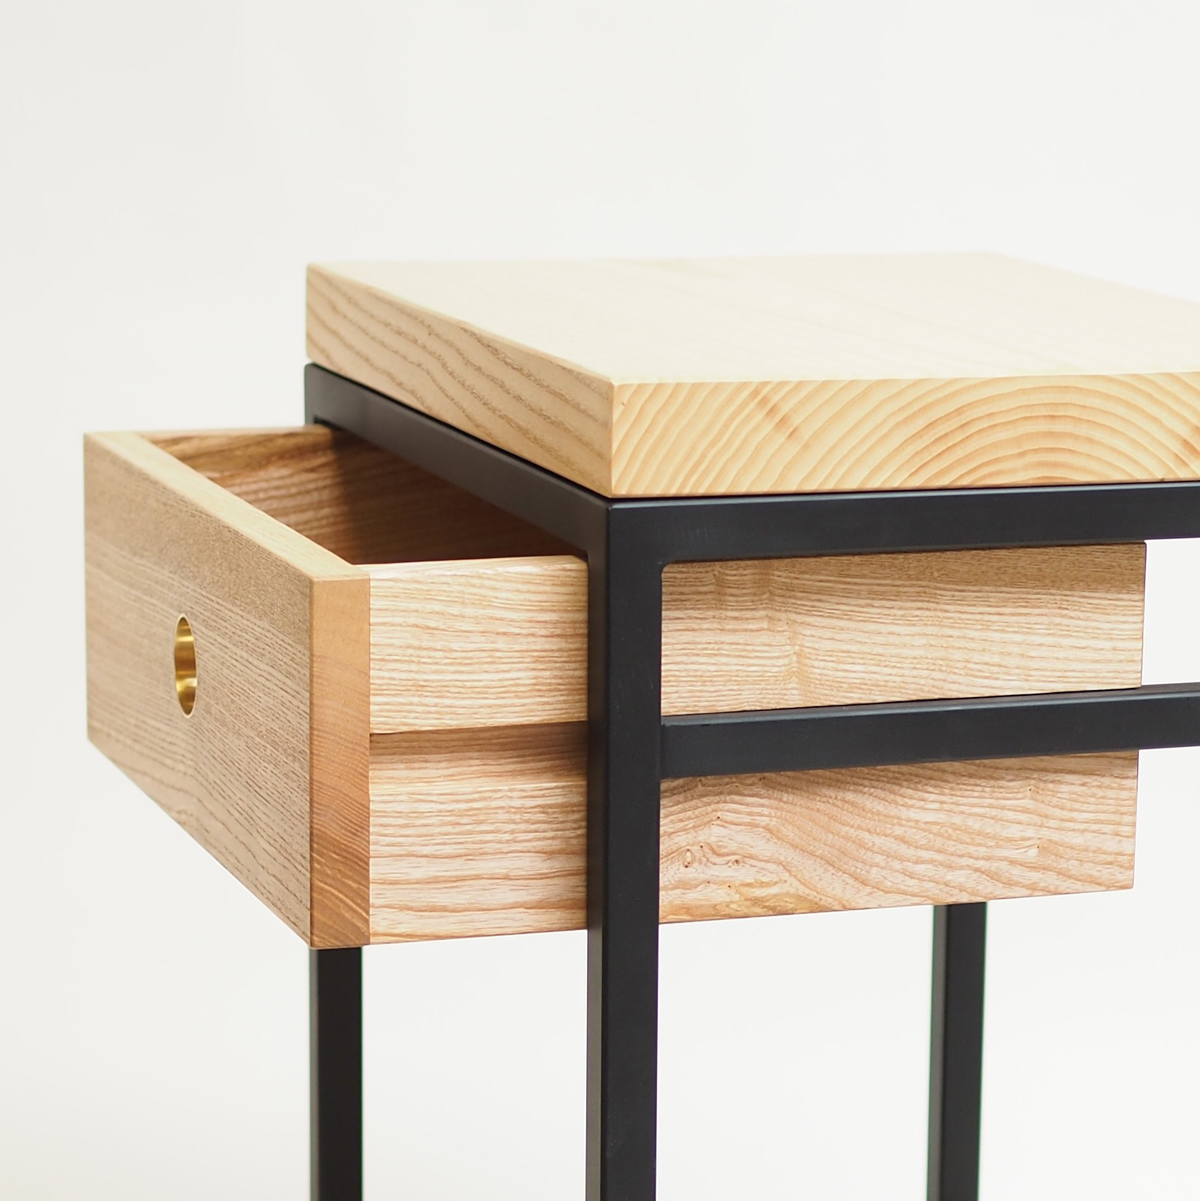 Draw-runners-grid-sidetable-bedside-table.jpg